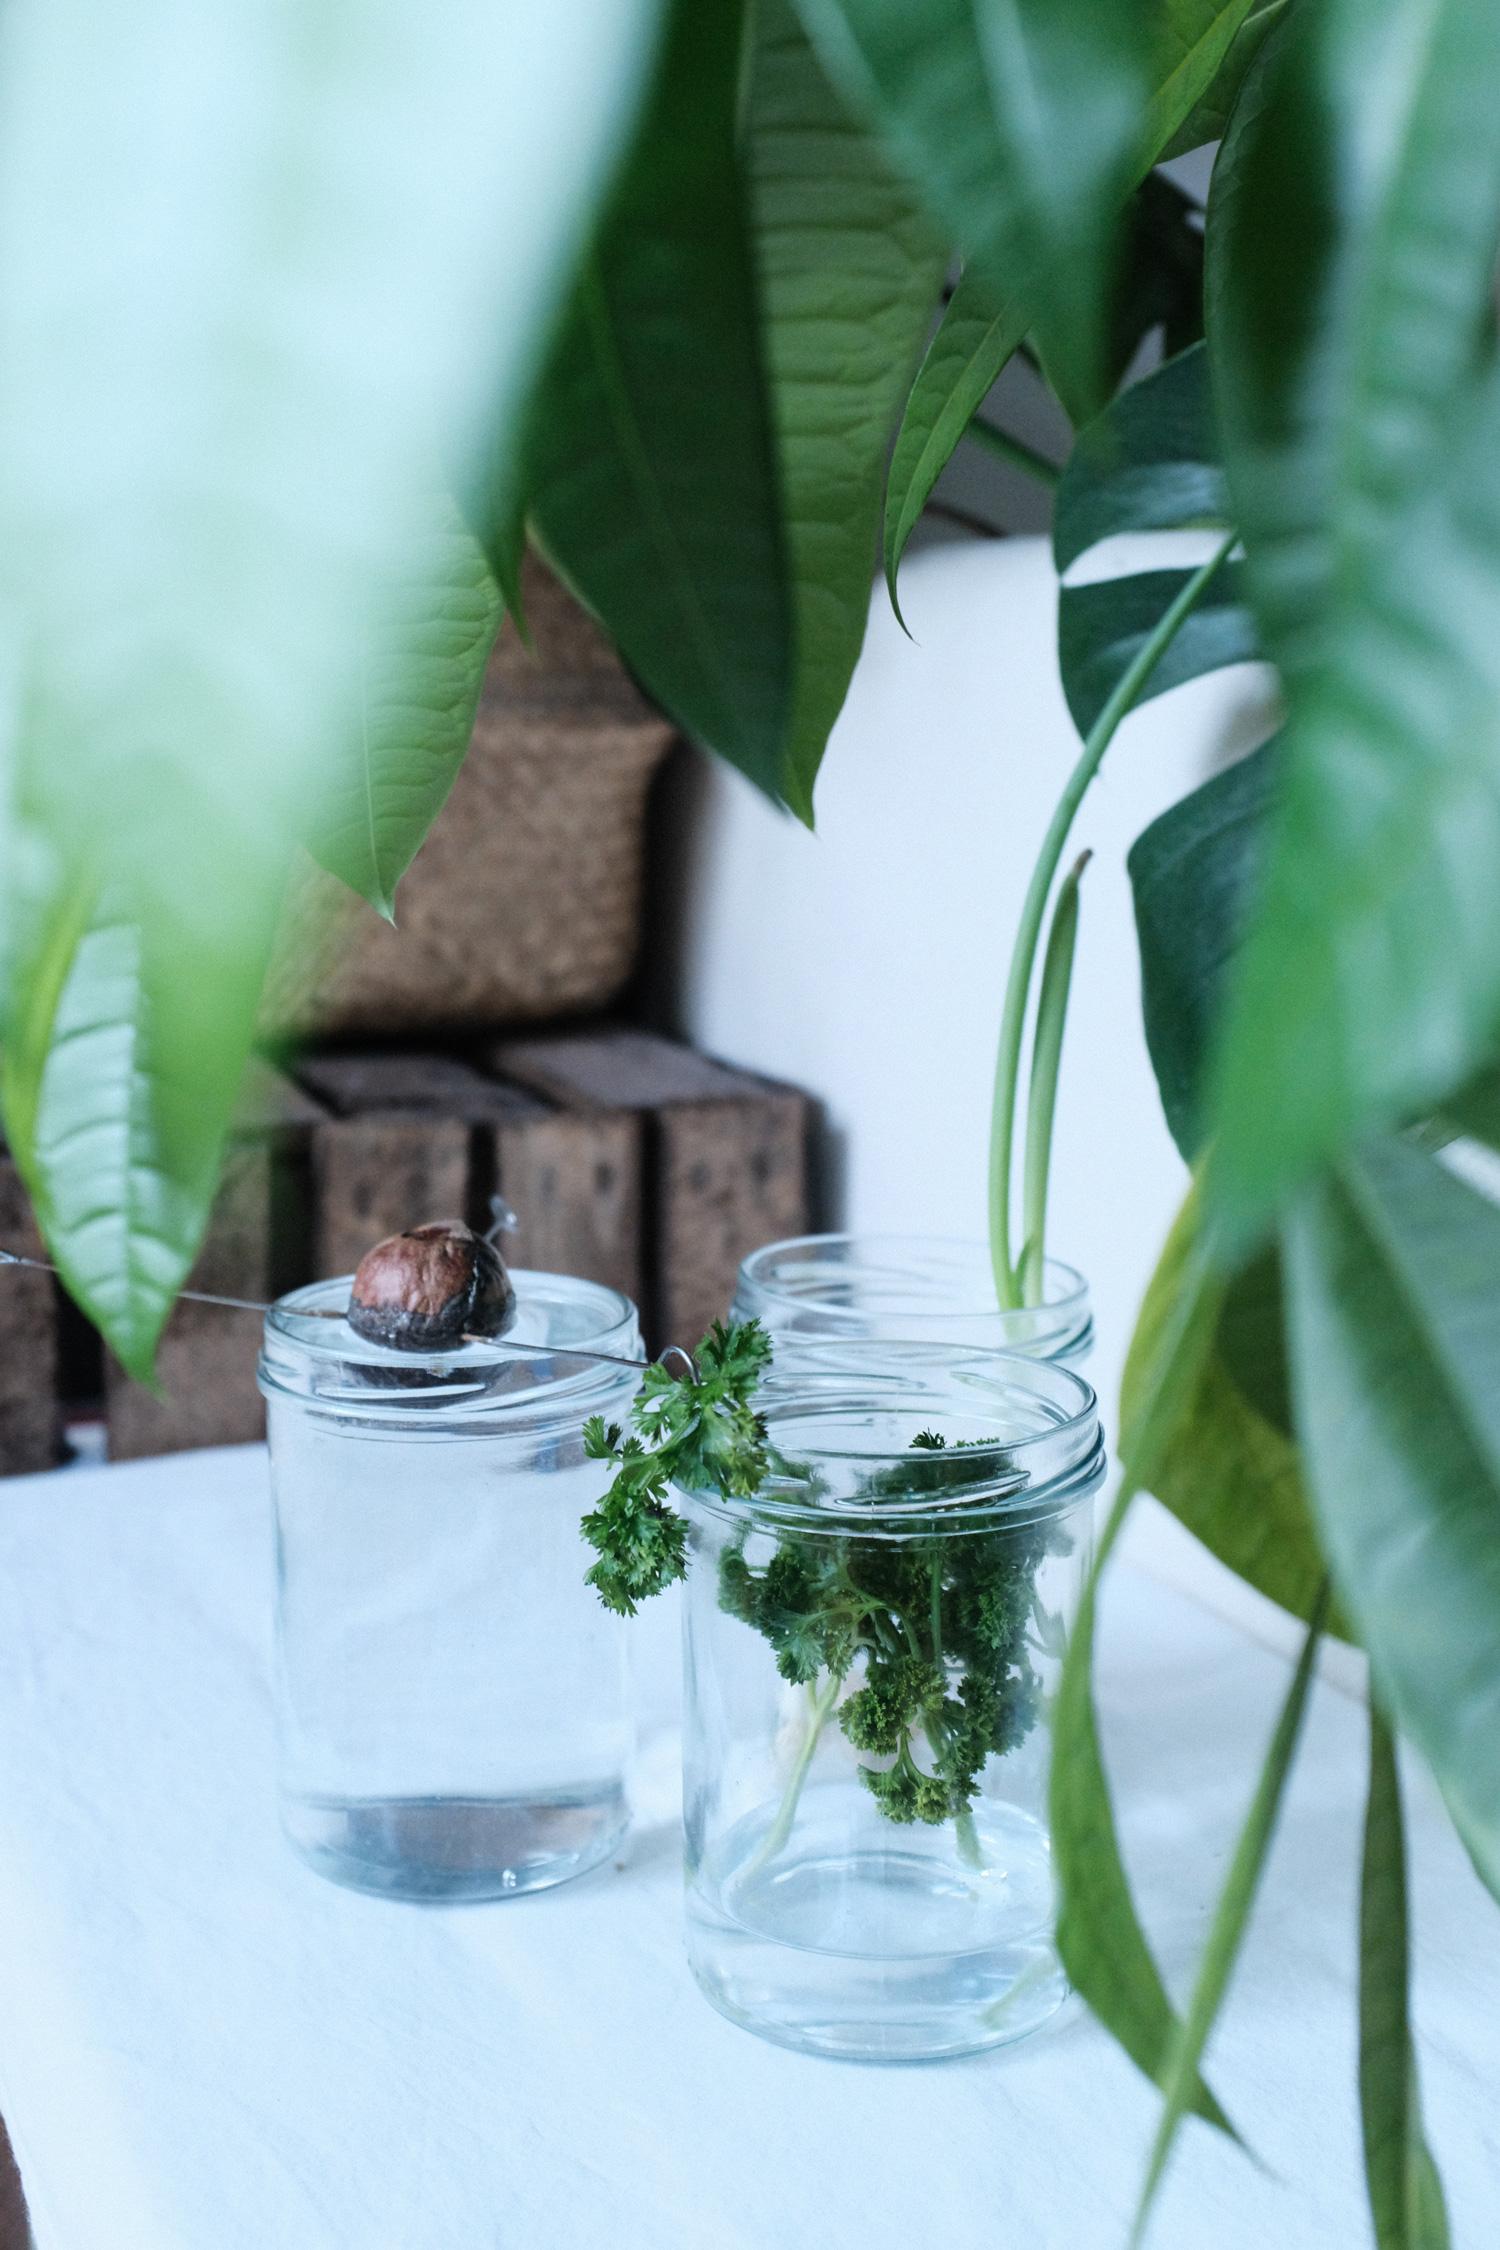 Completeorganics Upcycling Sproesslinge